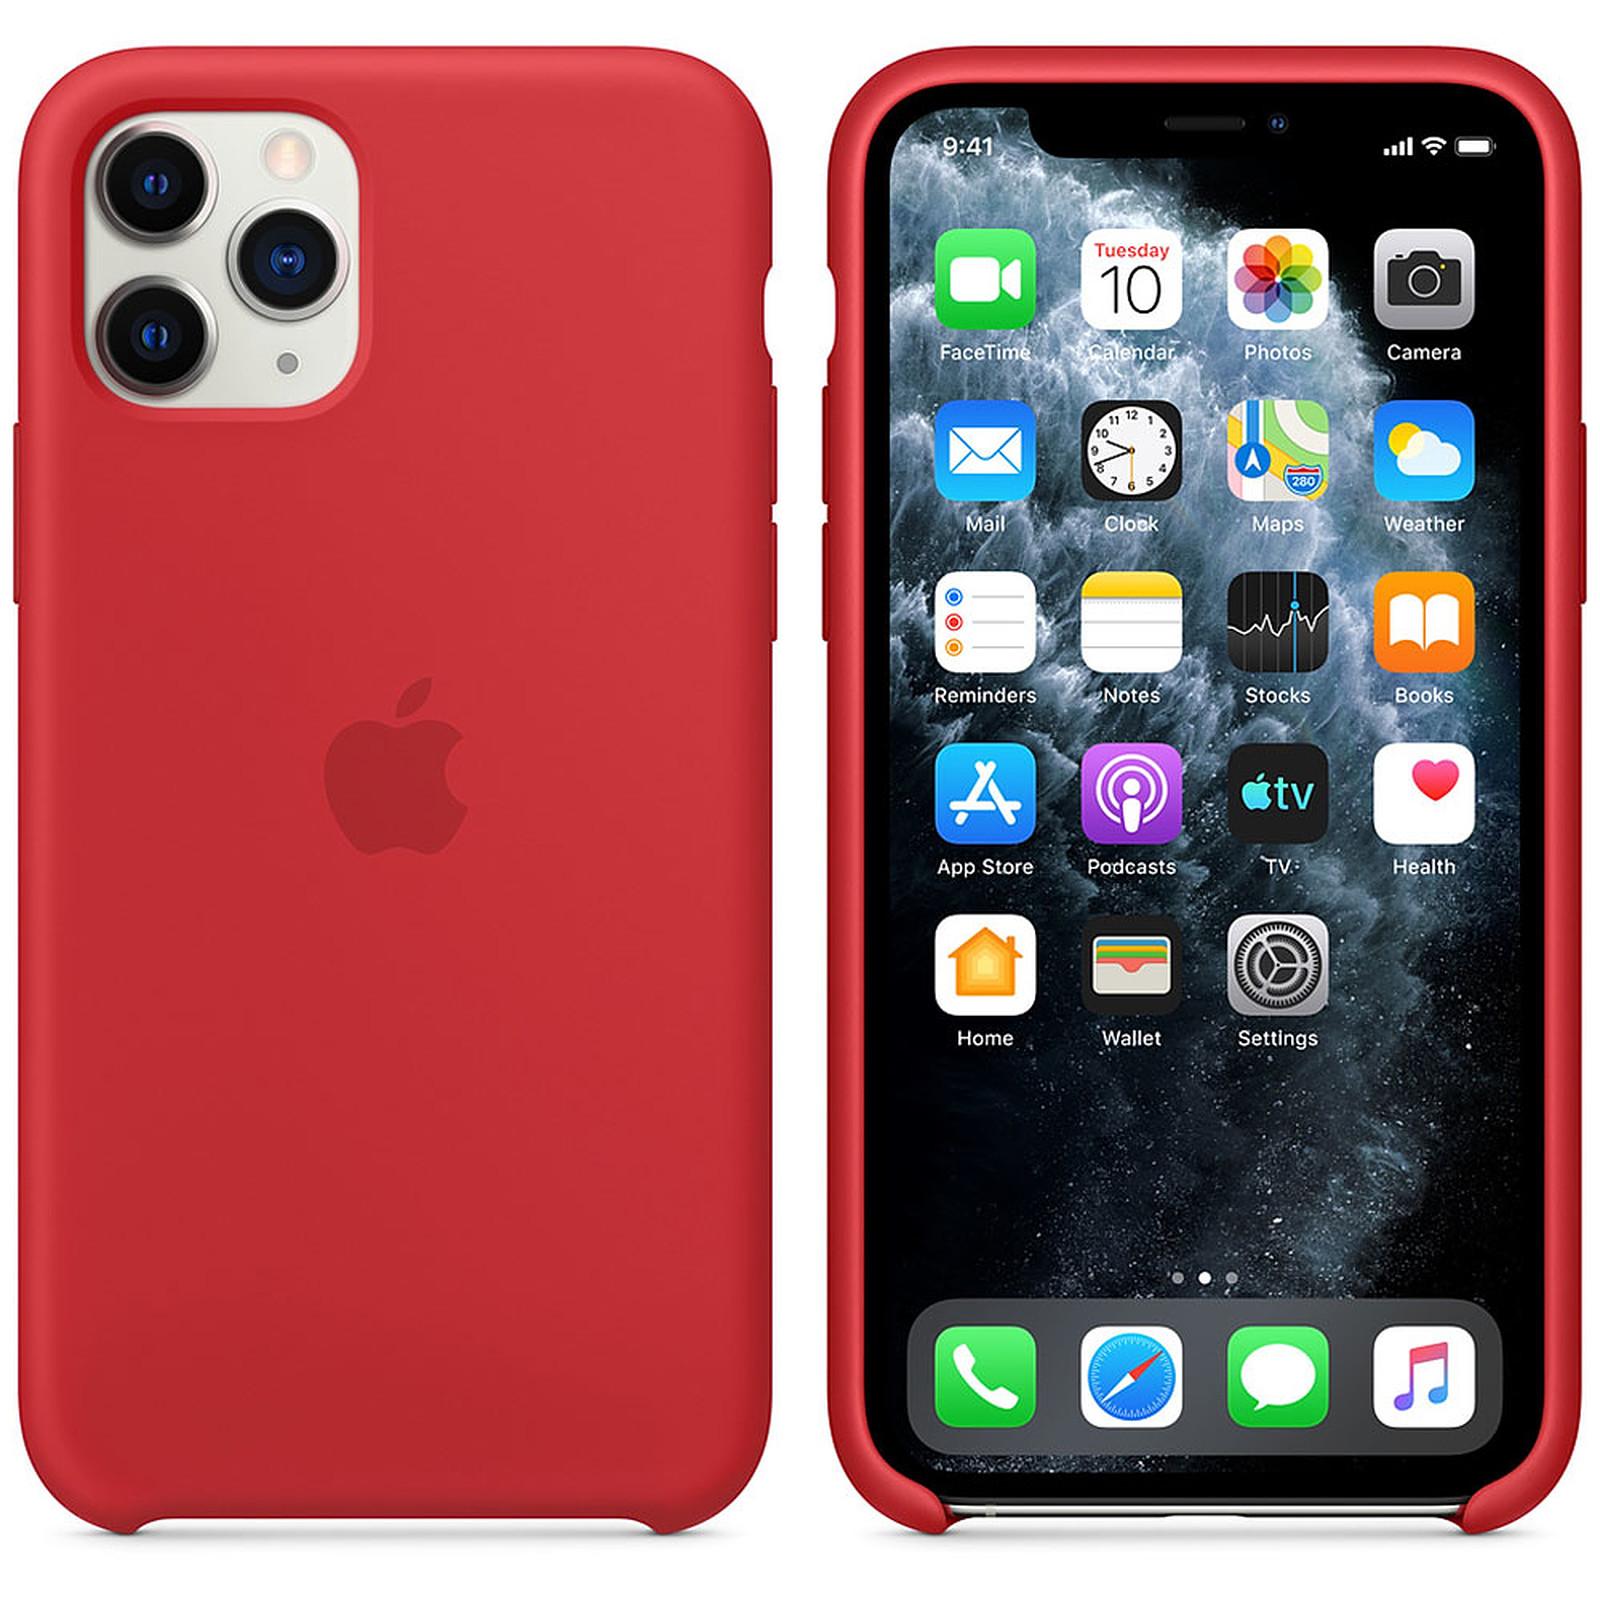 Apple Funda de silicona (PRODUCTO)RED Apple iPhone 11 Pro